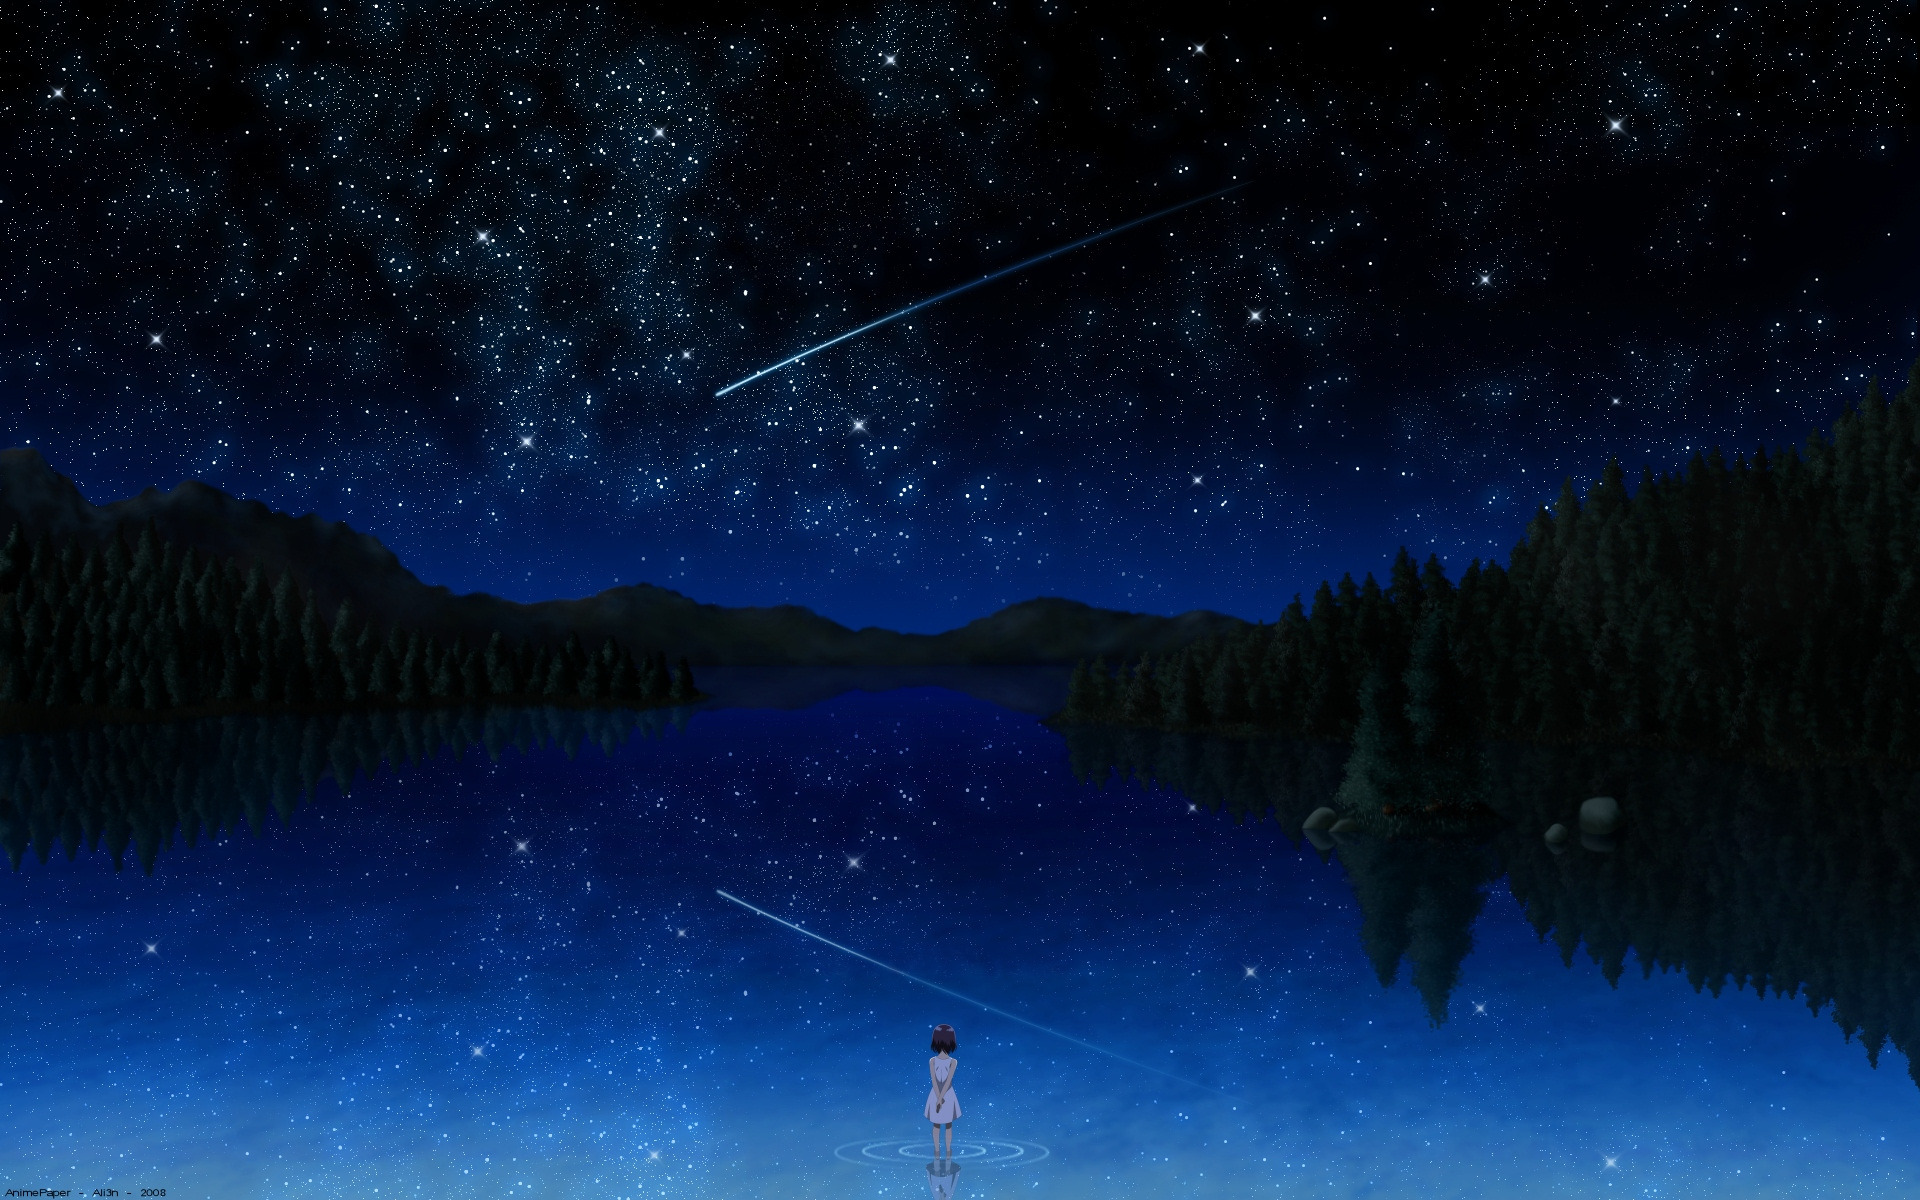 Darker Than Black Night Pai Signed Sky Stars Tree Water T Wallpaper 1920x1200 72363 Wallpaperup